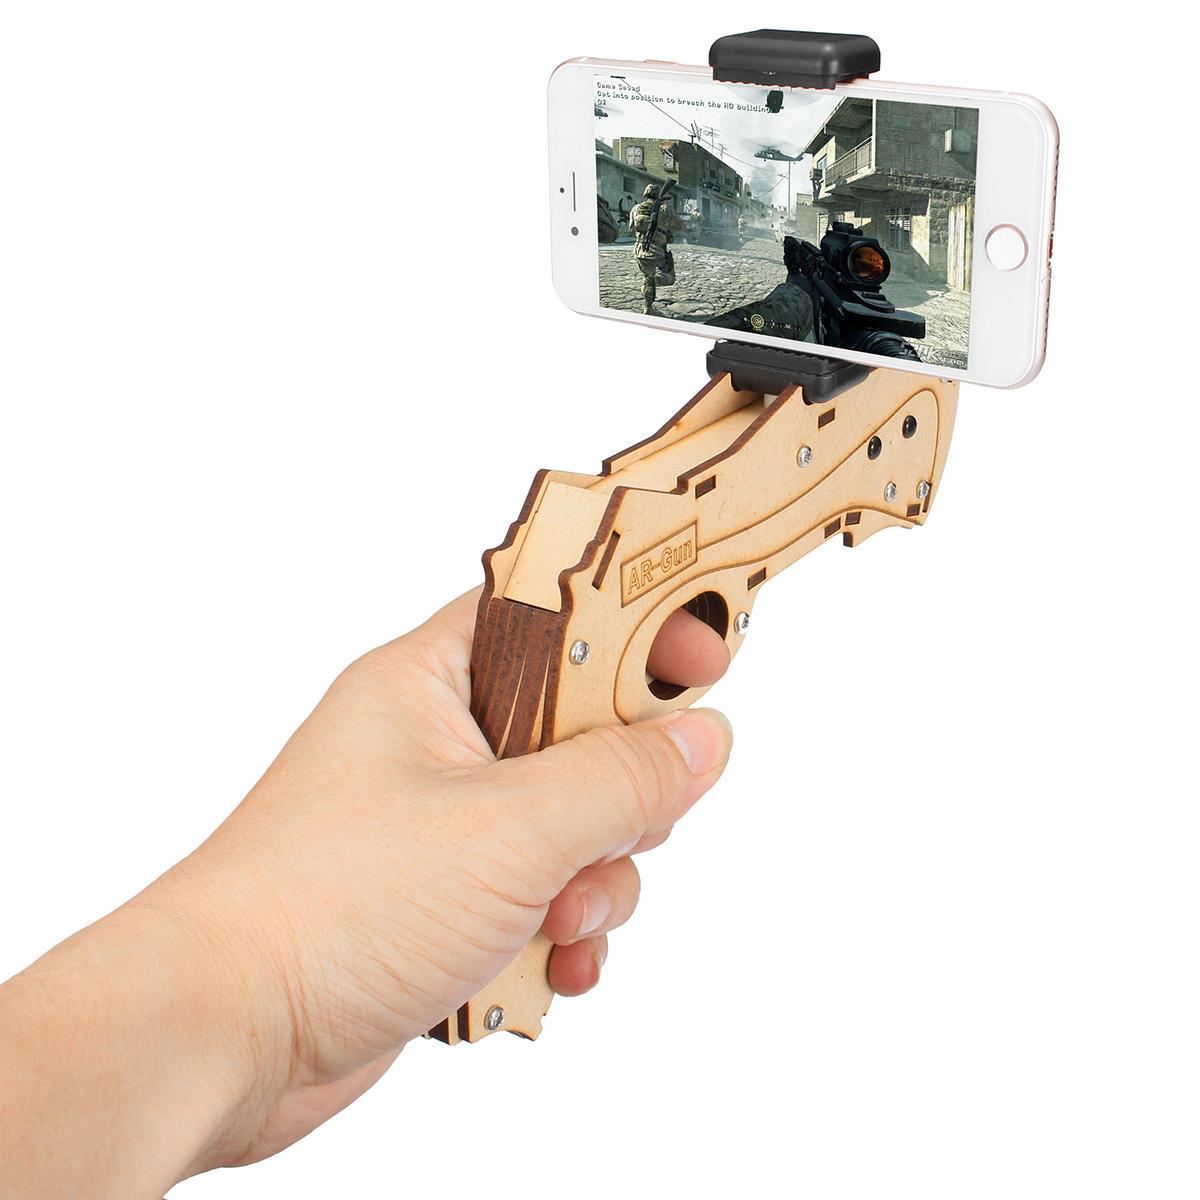 DIY Realidad aumentada AR Toy con teléfono celular Stand Holder Protable Wood AR